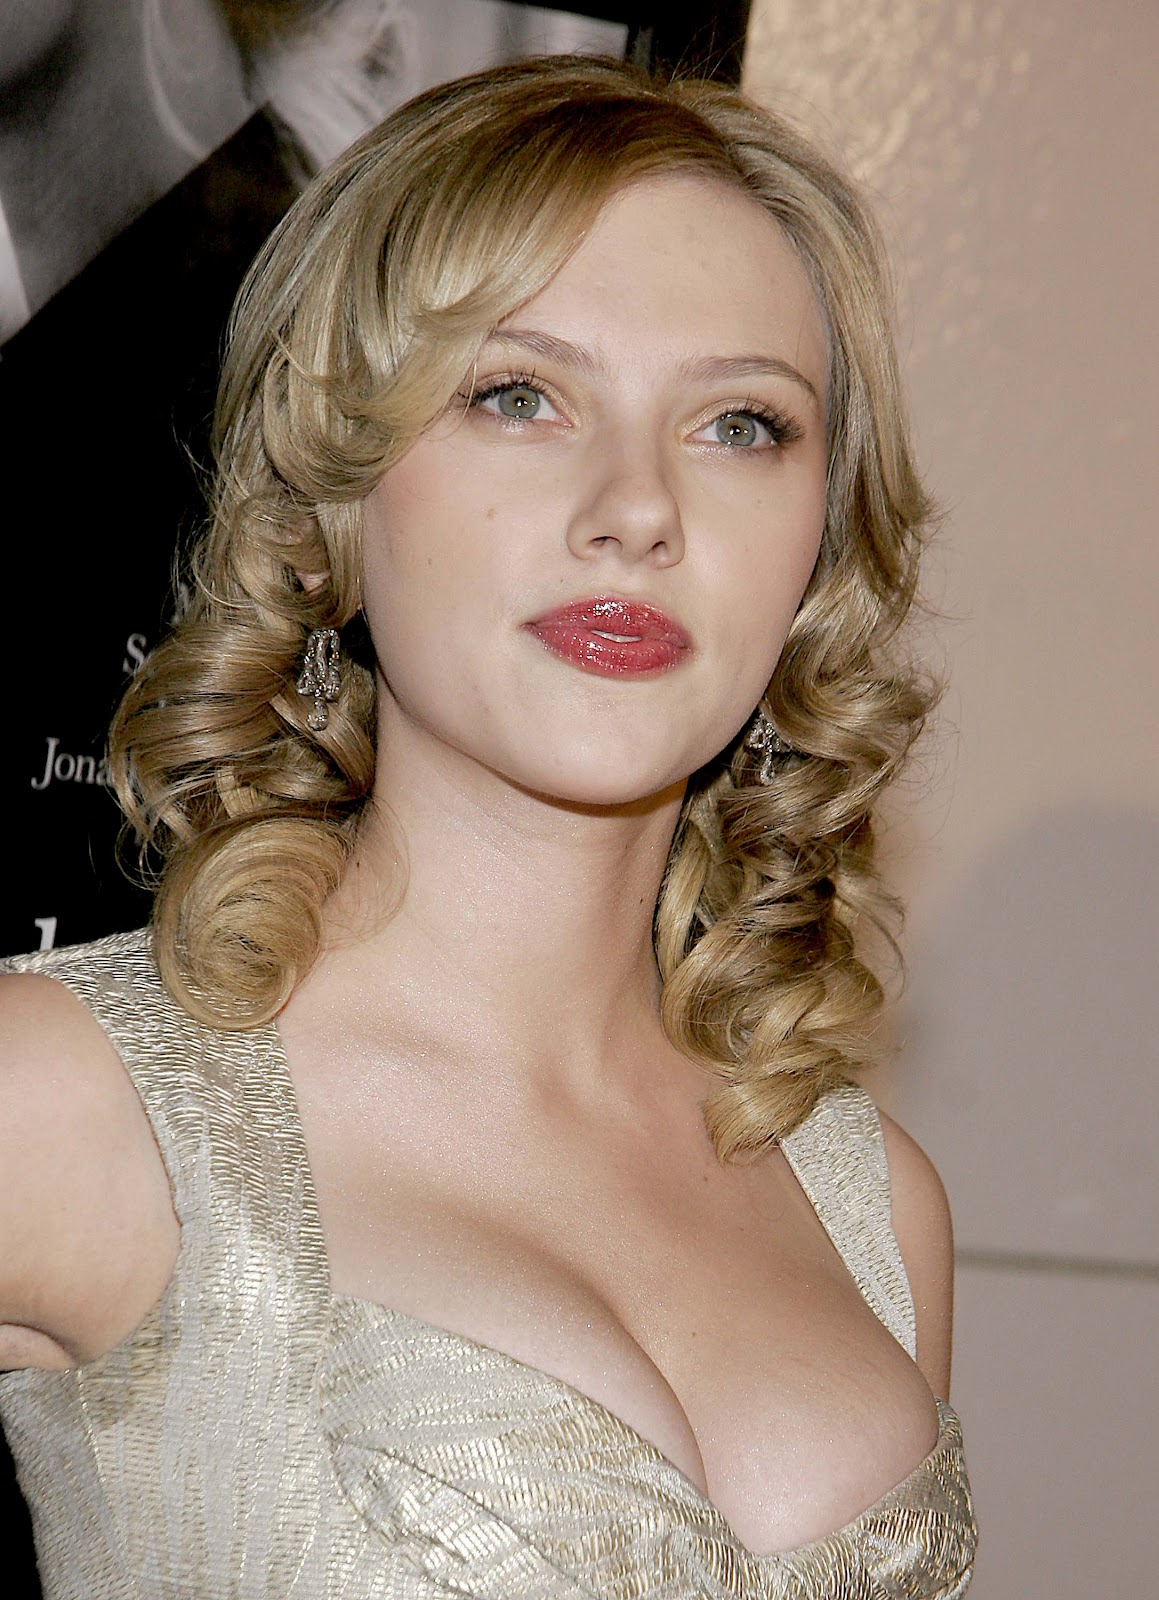 Scarlett Johansson pic...